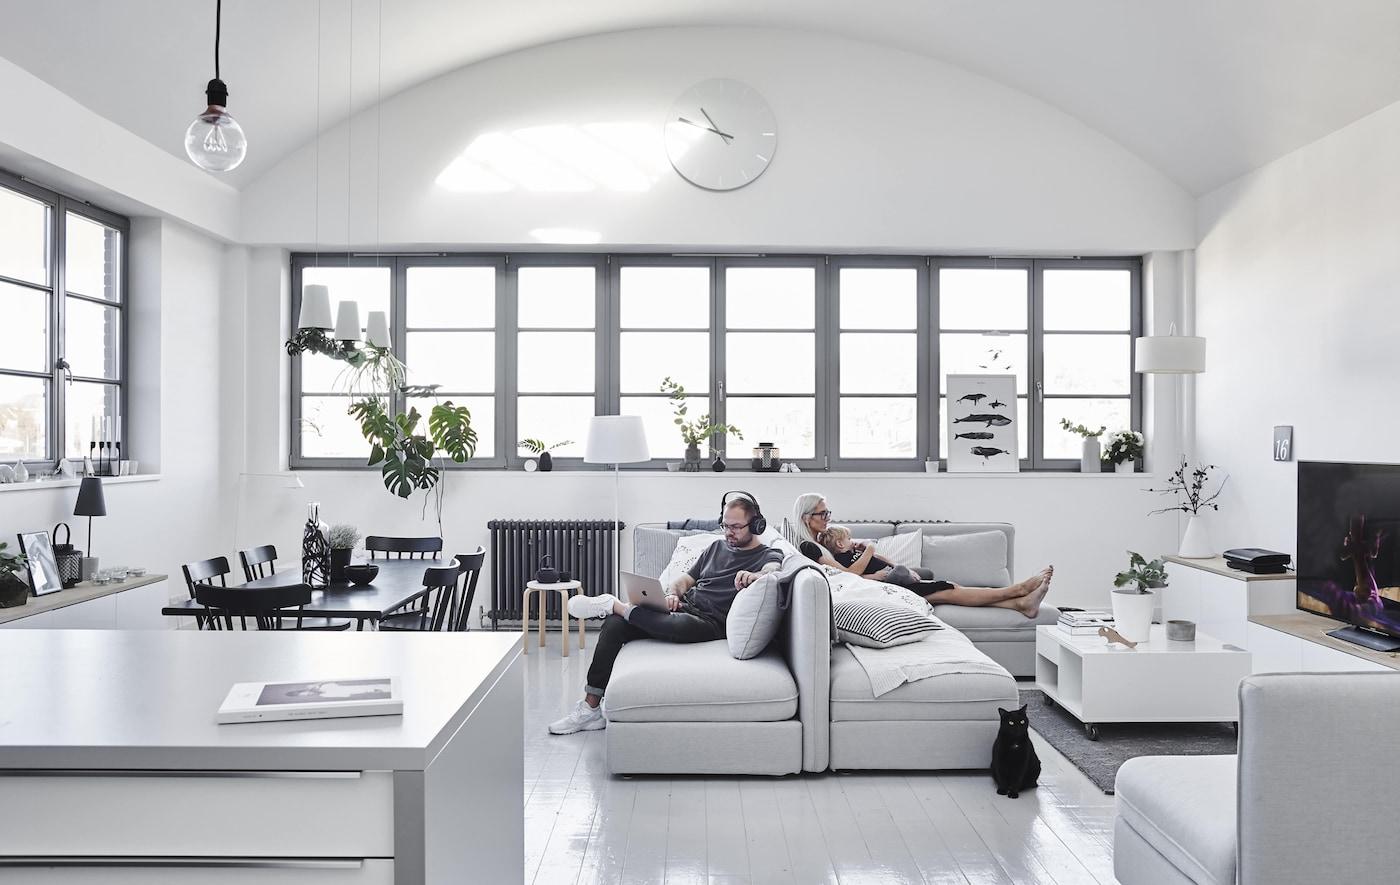 modulsofa arrangieren ikea. Black Bedroom Furniture Sets. Home Design Ideas